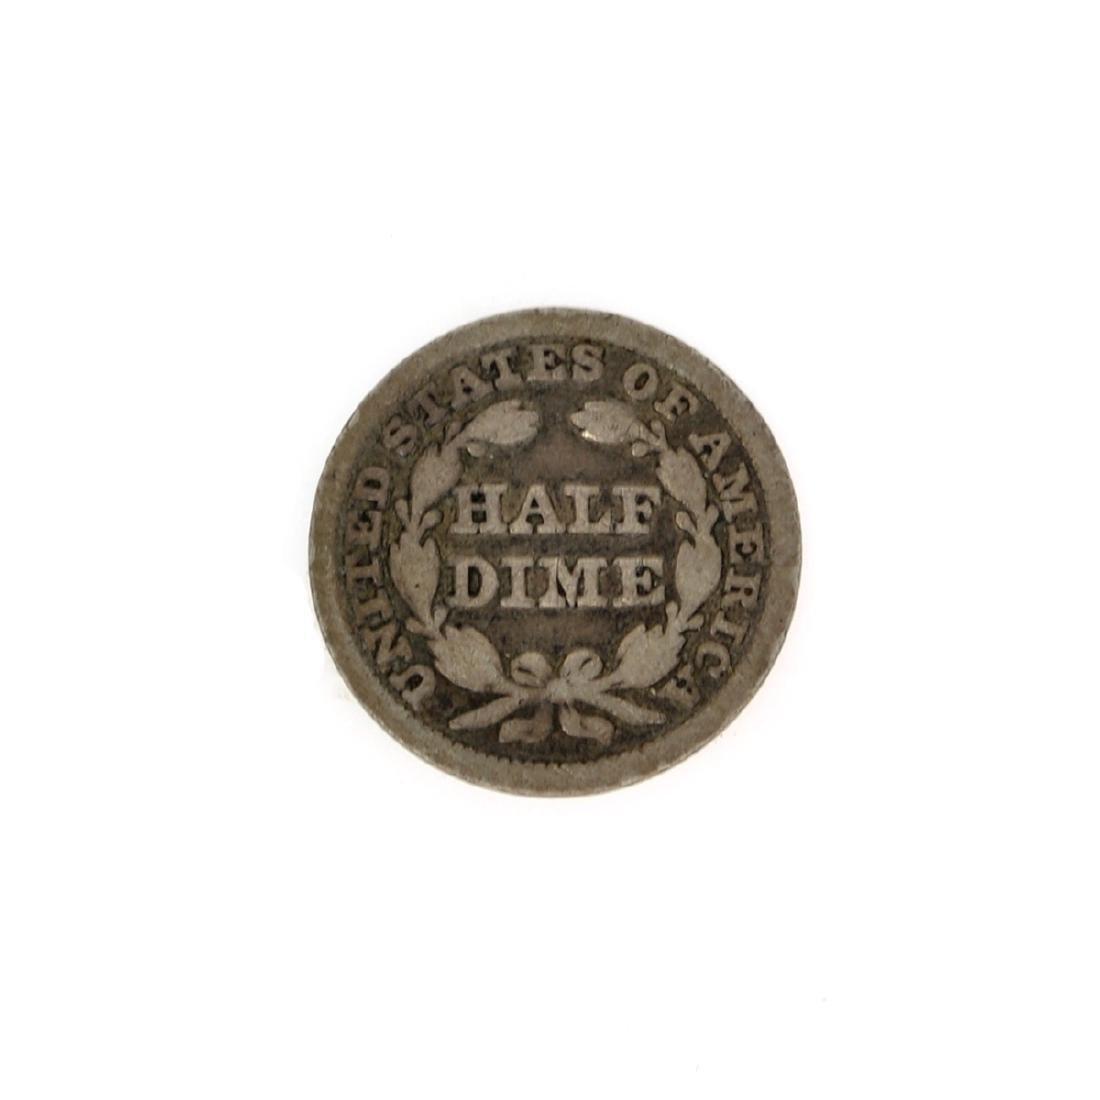 Rare 1849 Liberty Seated Half Dime Coin - 2